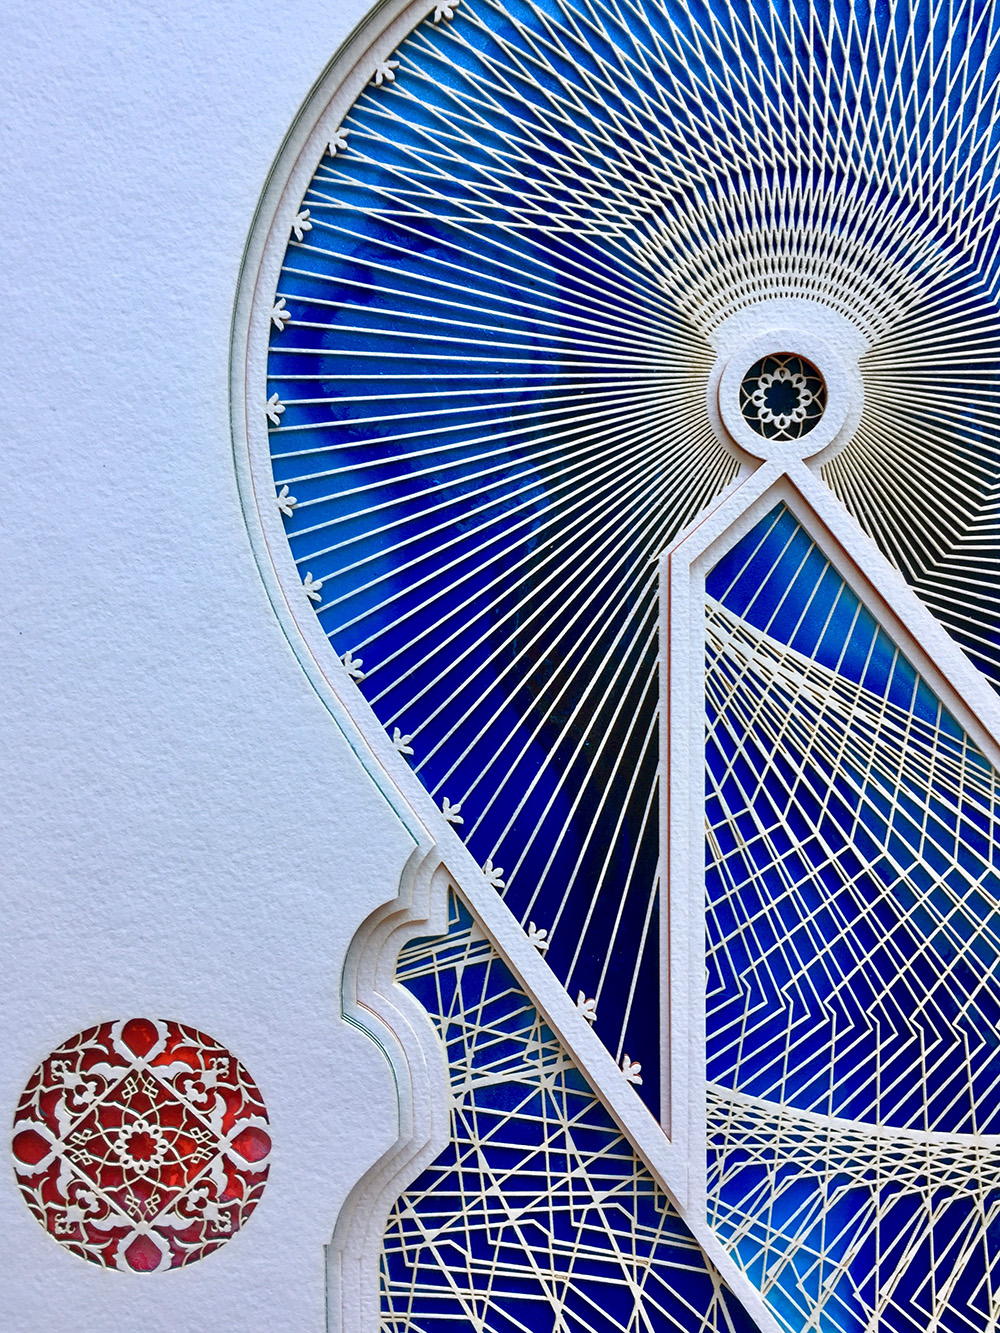 Detail from through the doorway to lapis lazuli